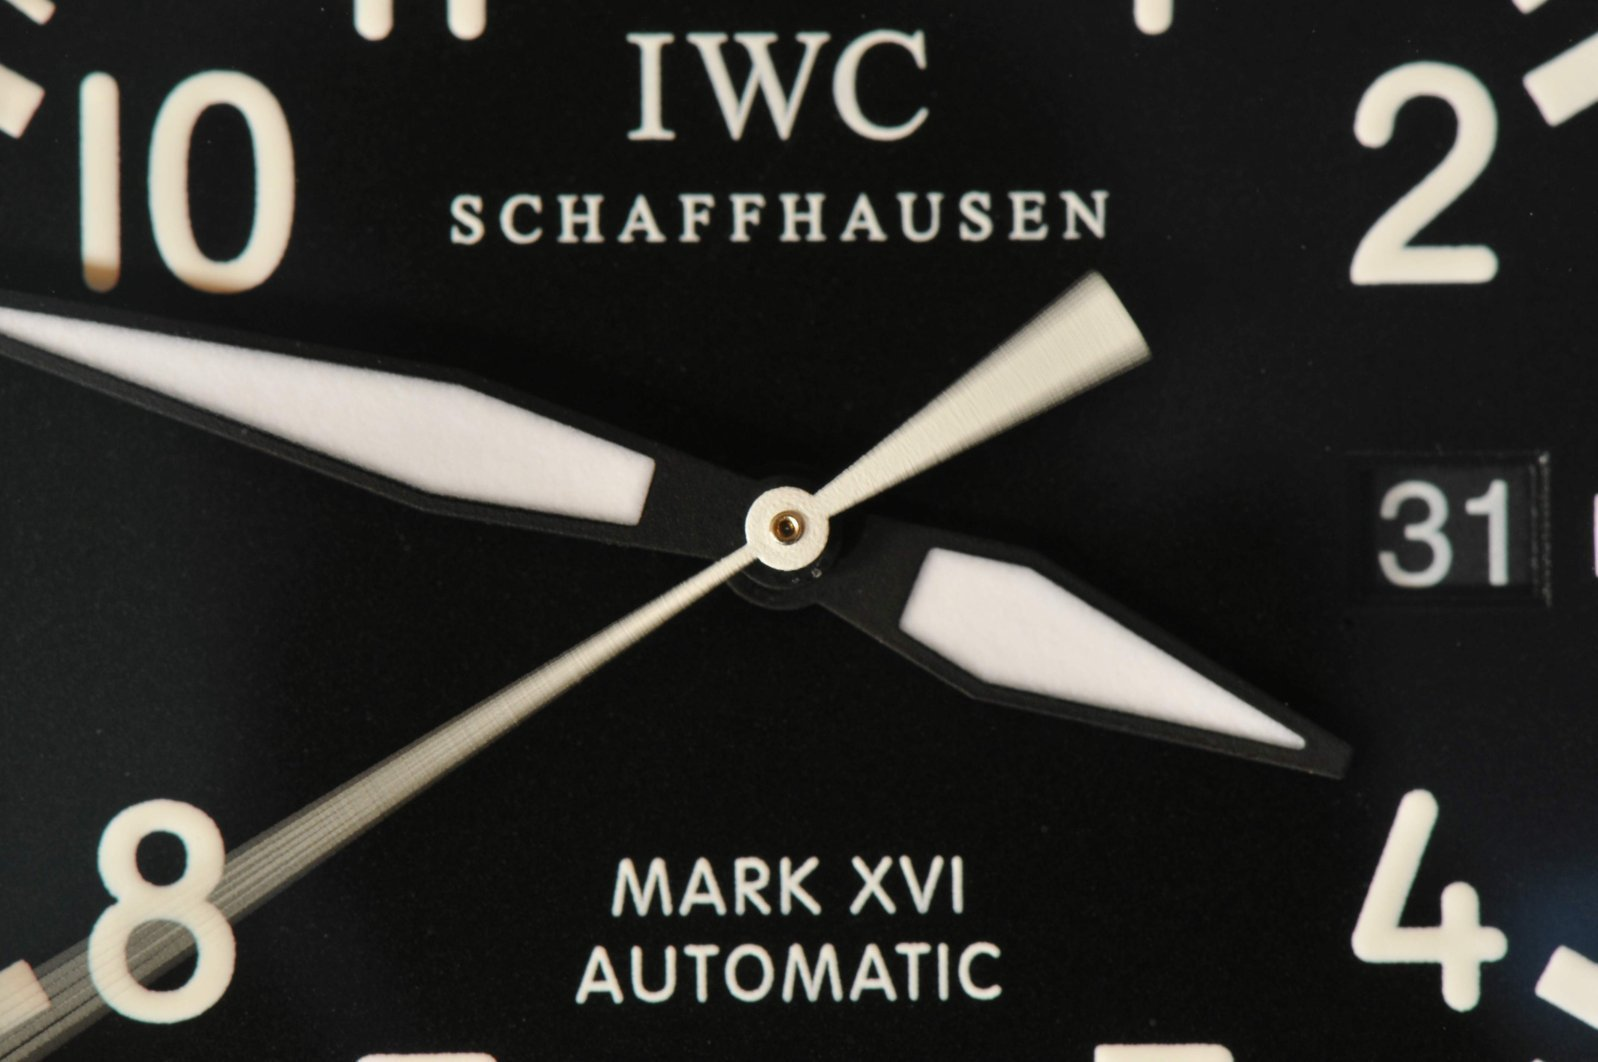 IWC M Macro 2-4.jpg